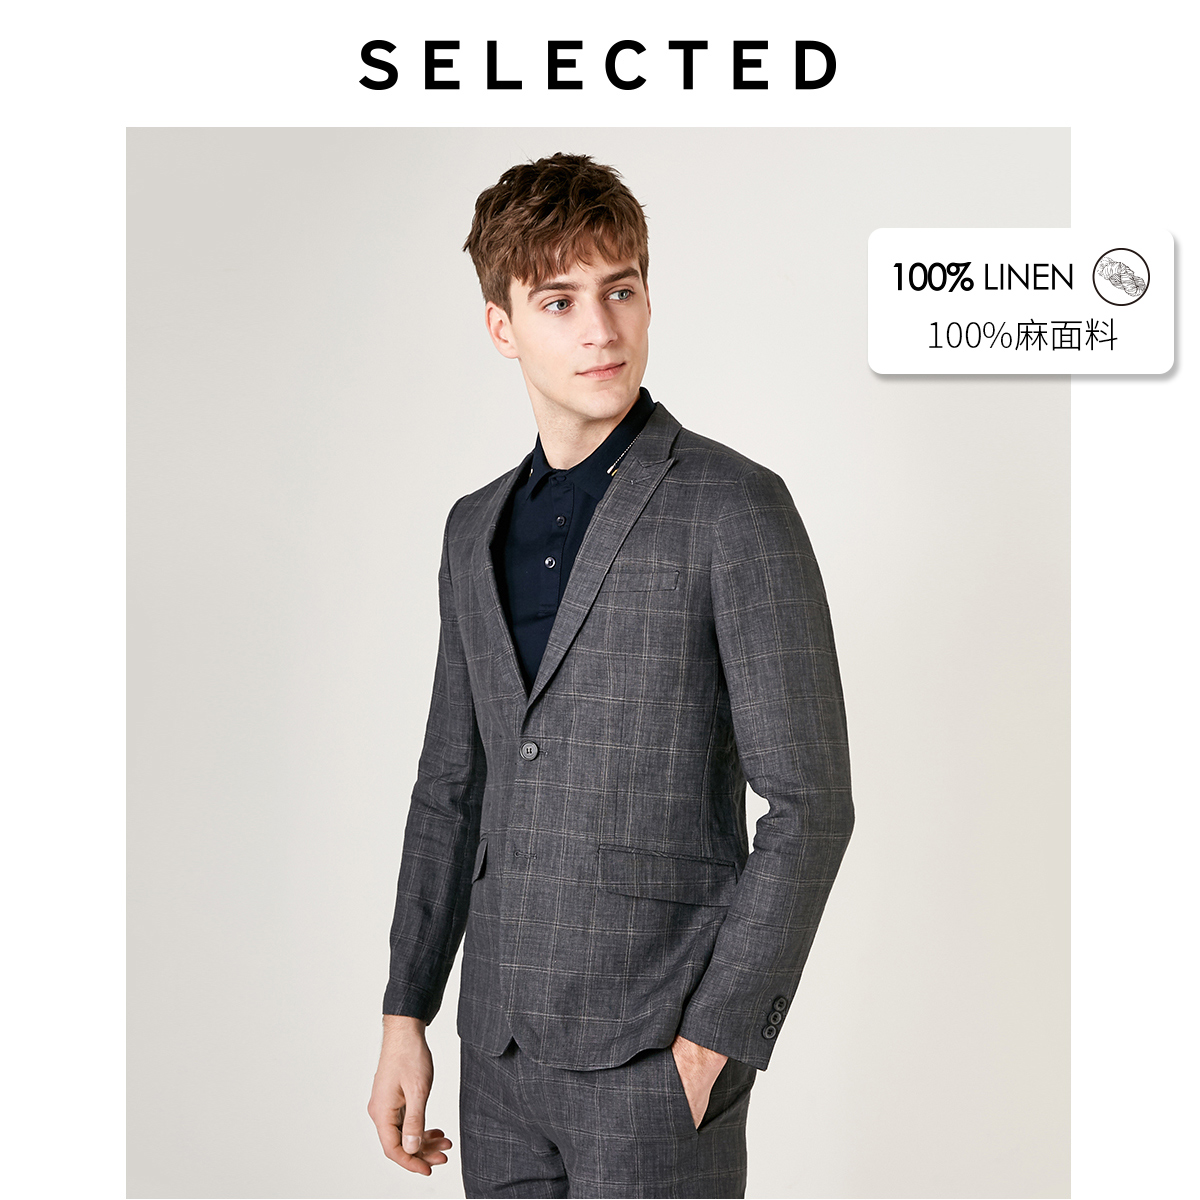 SELECTED Men's Summer Plaid Blazer Linen Business Casual Regular Slim-Fit Clothes S   419272514